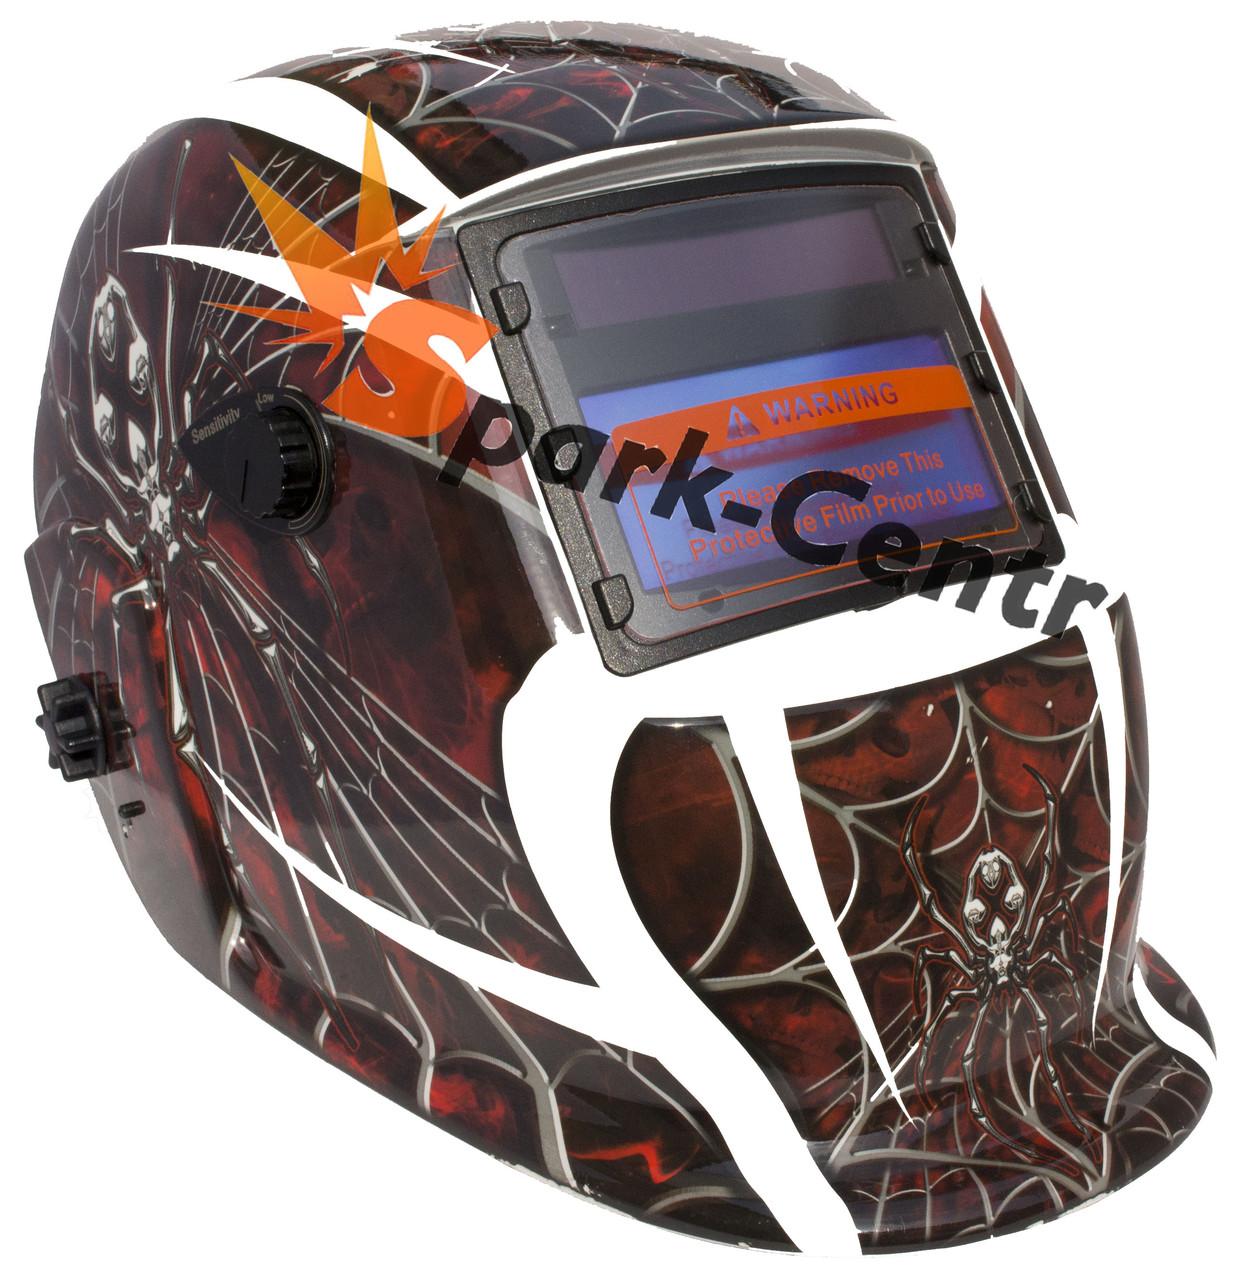 Сварочная маска хамелеон Optech S777B Spider (4 сенсора)